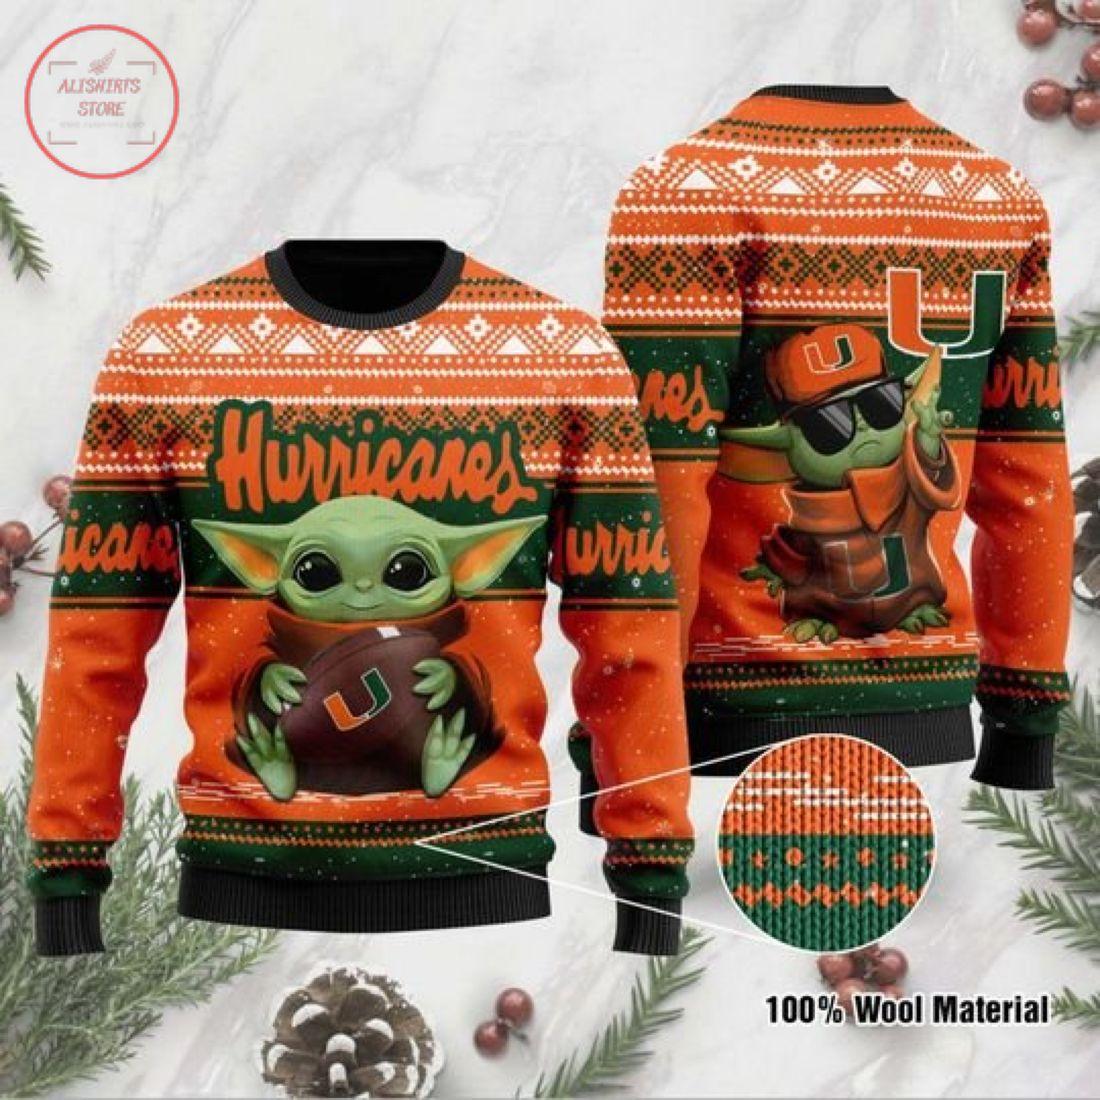 Baby Yoda Miami Hurricanes Ugly Christmas Sweater